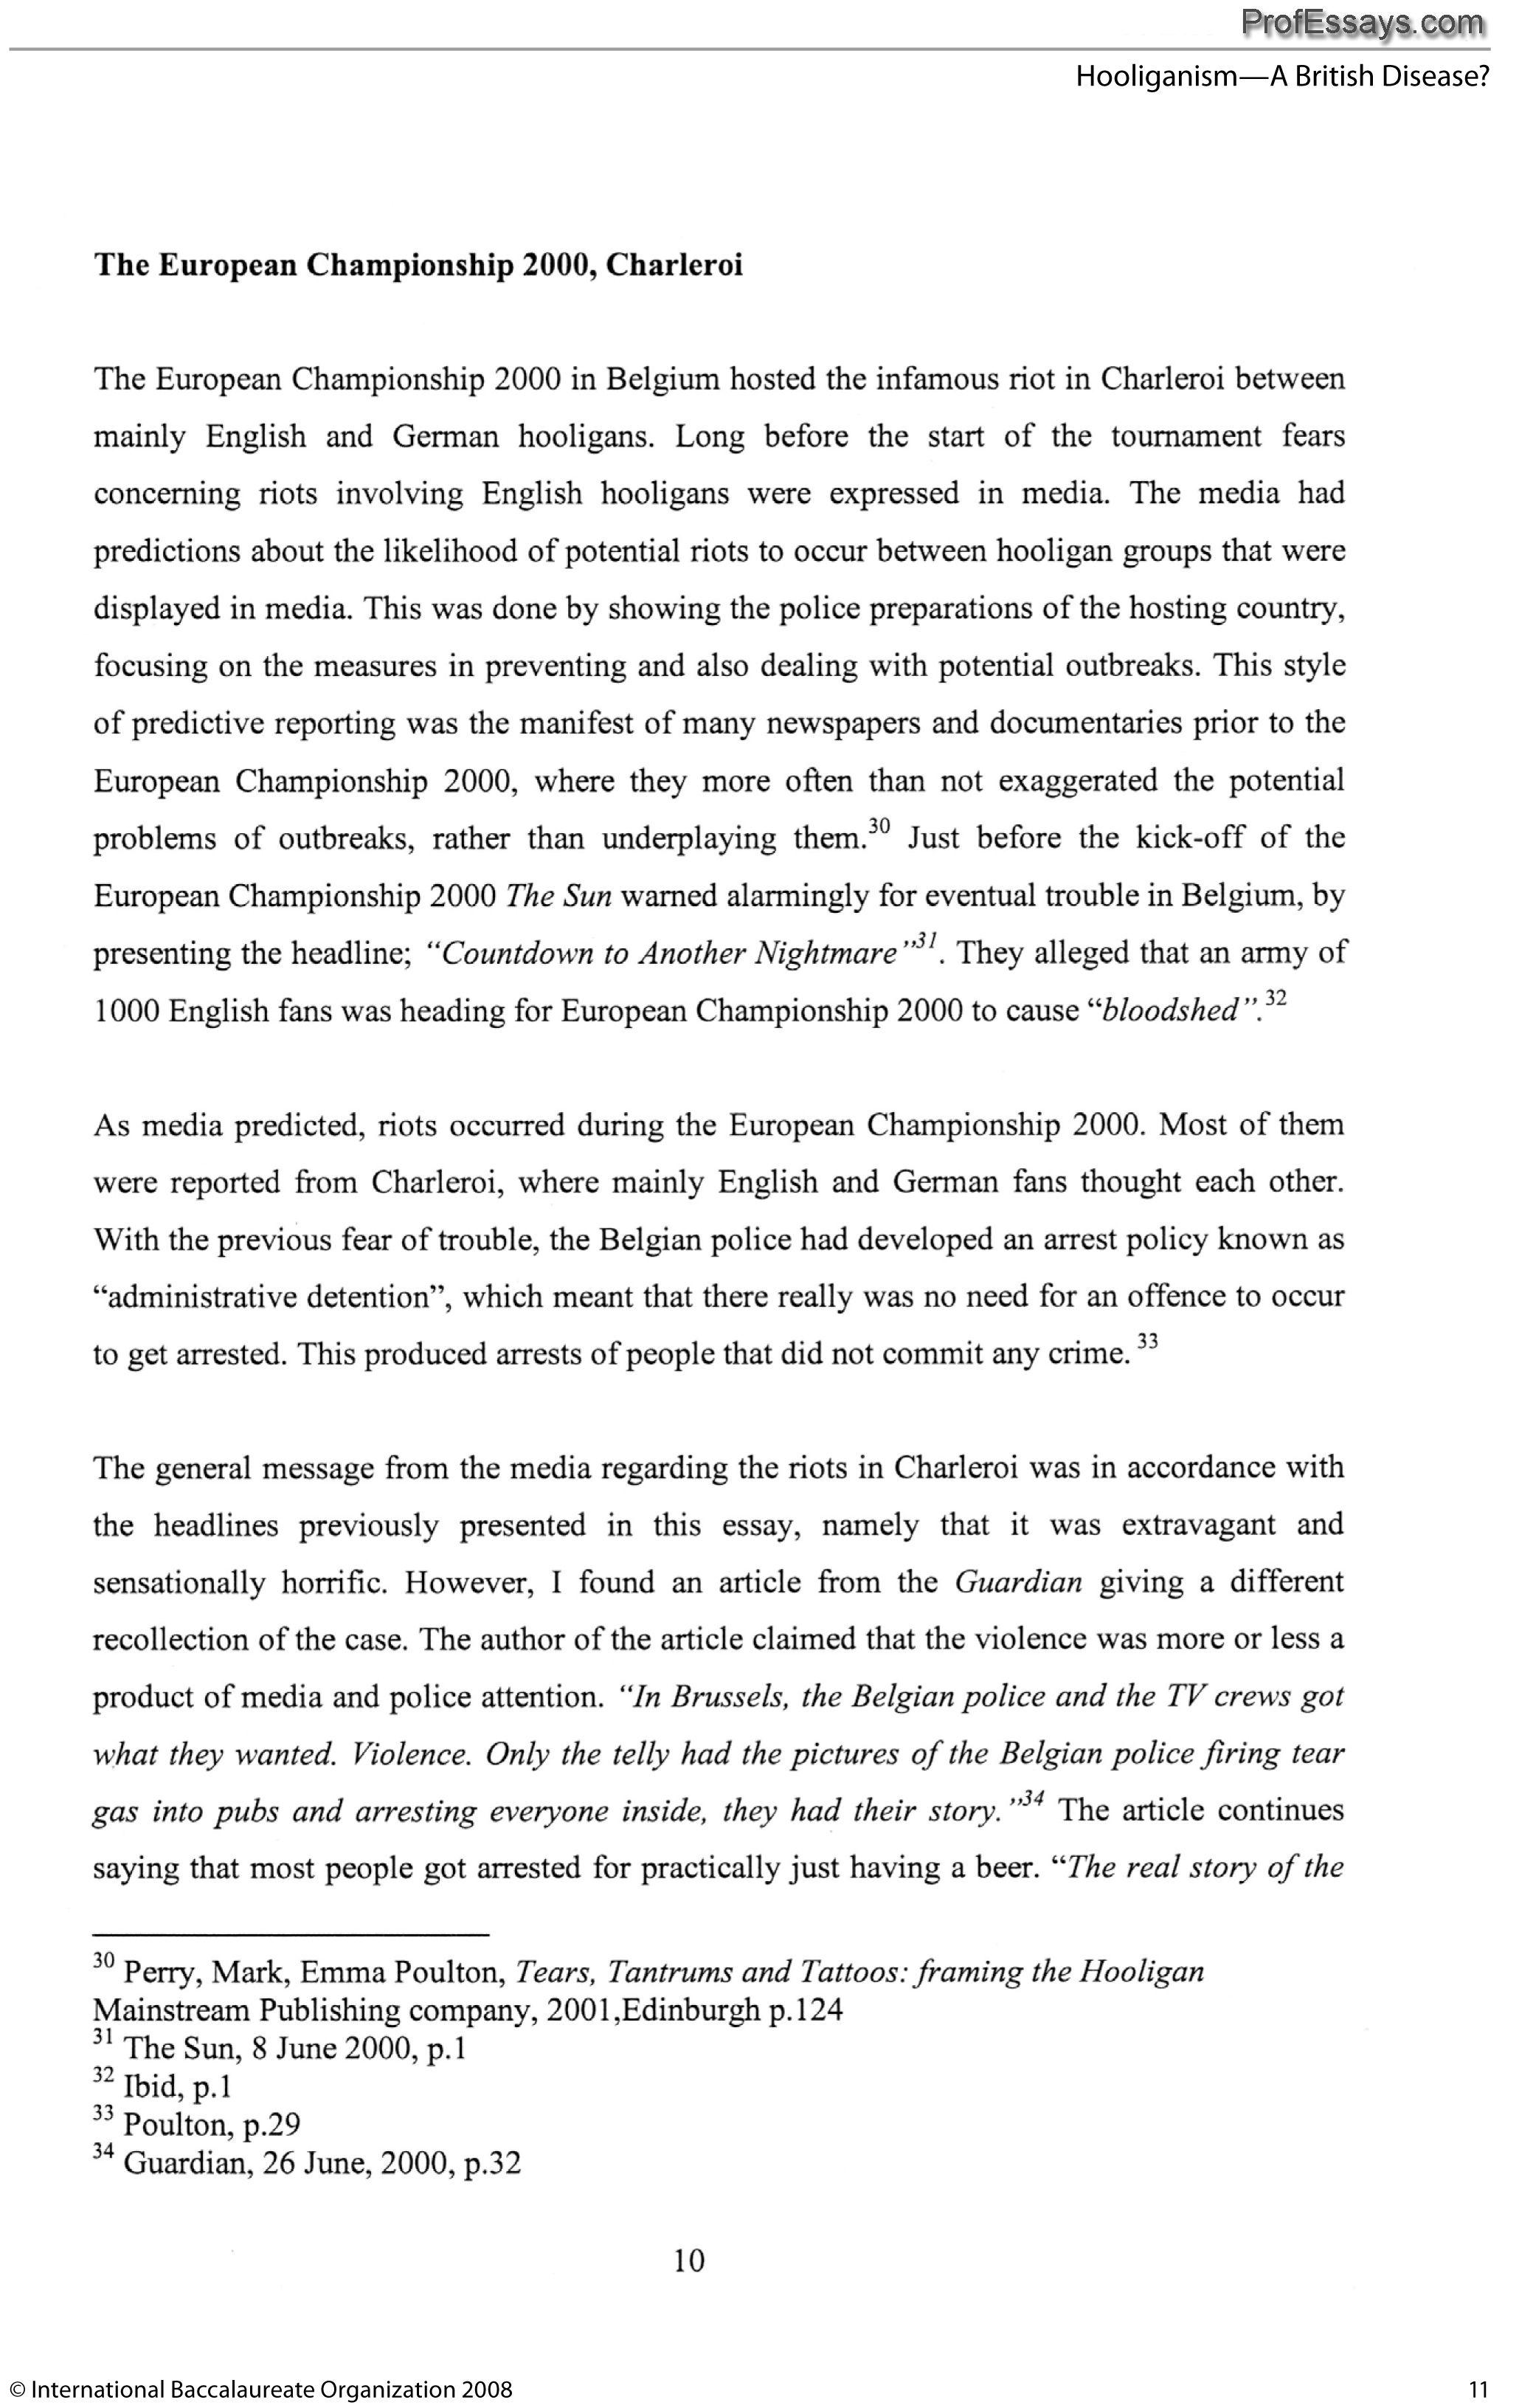 English Essay Writing Music Censorship Argumentative Informative